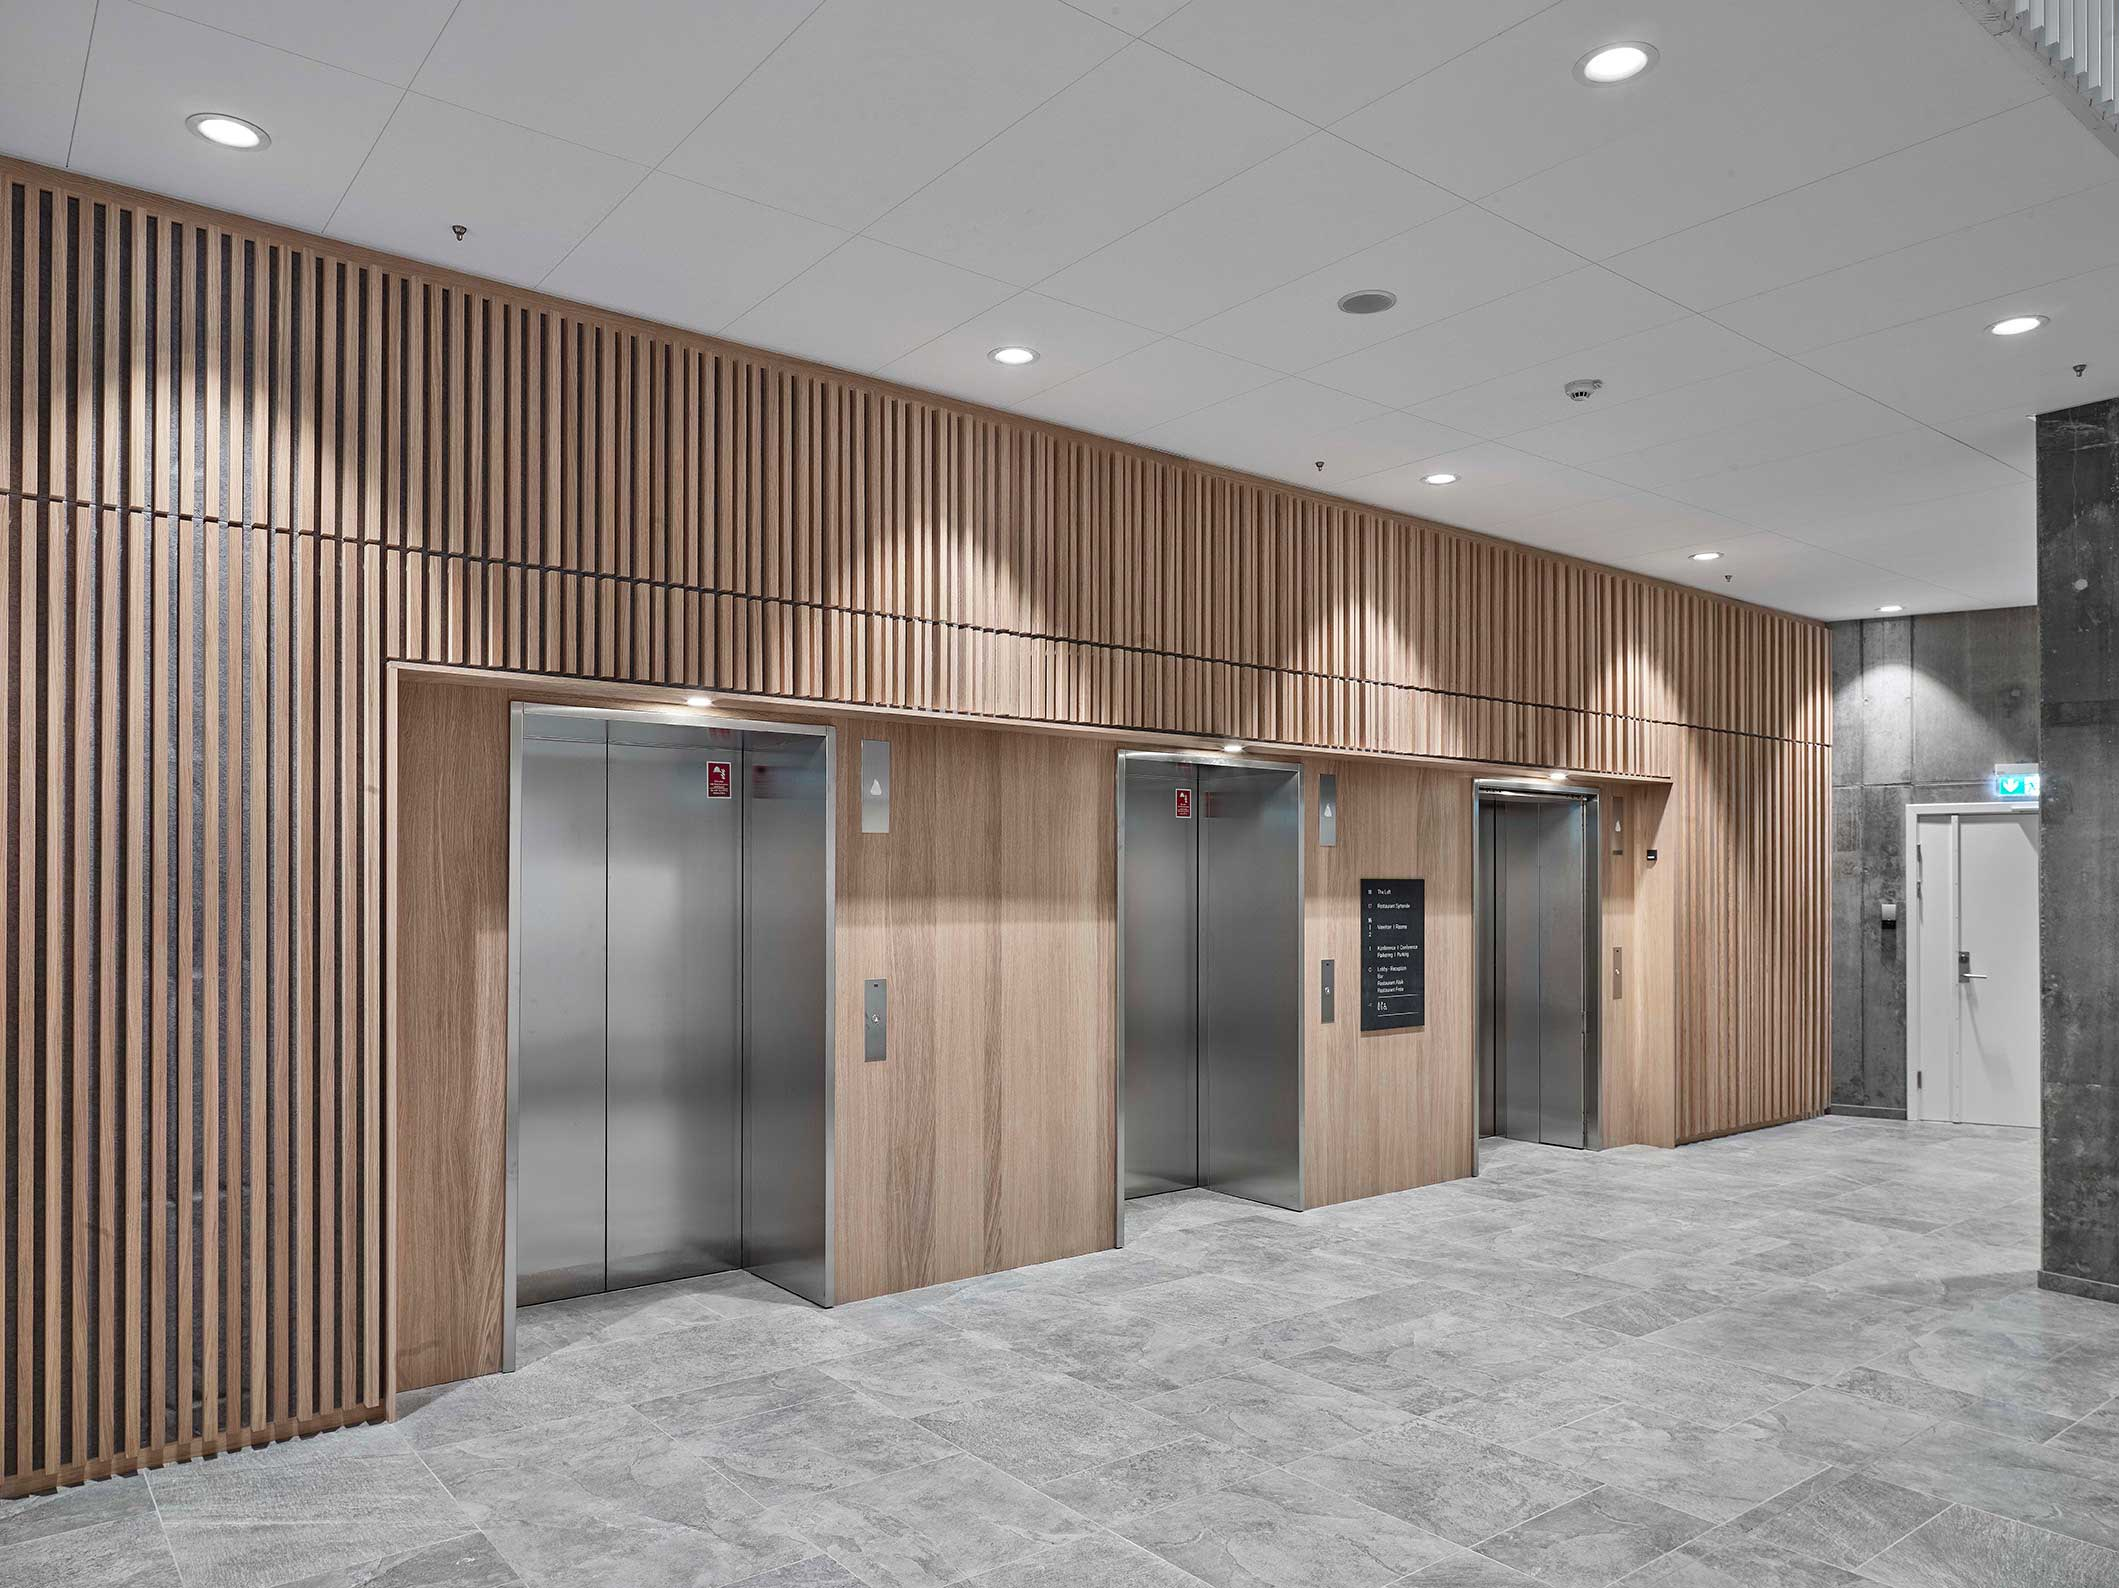 Linea DS-F 150 spotlight indbygget i loft ved elevatorer i hotel lobby - Luminex